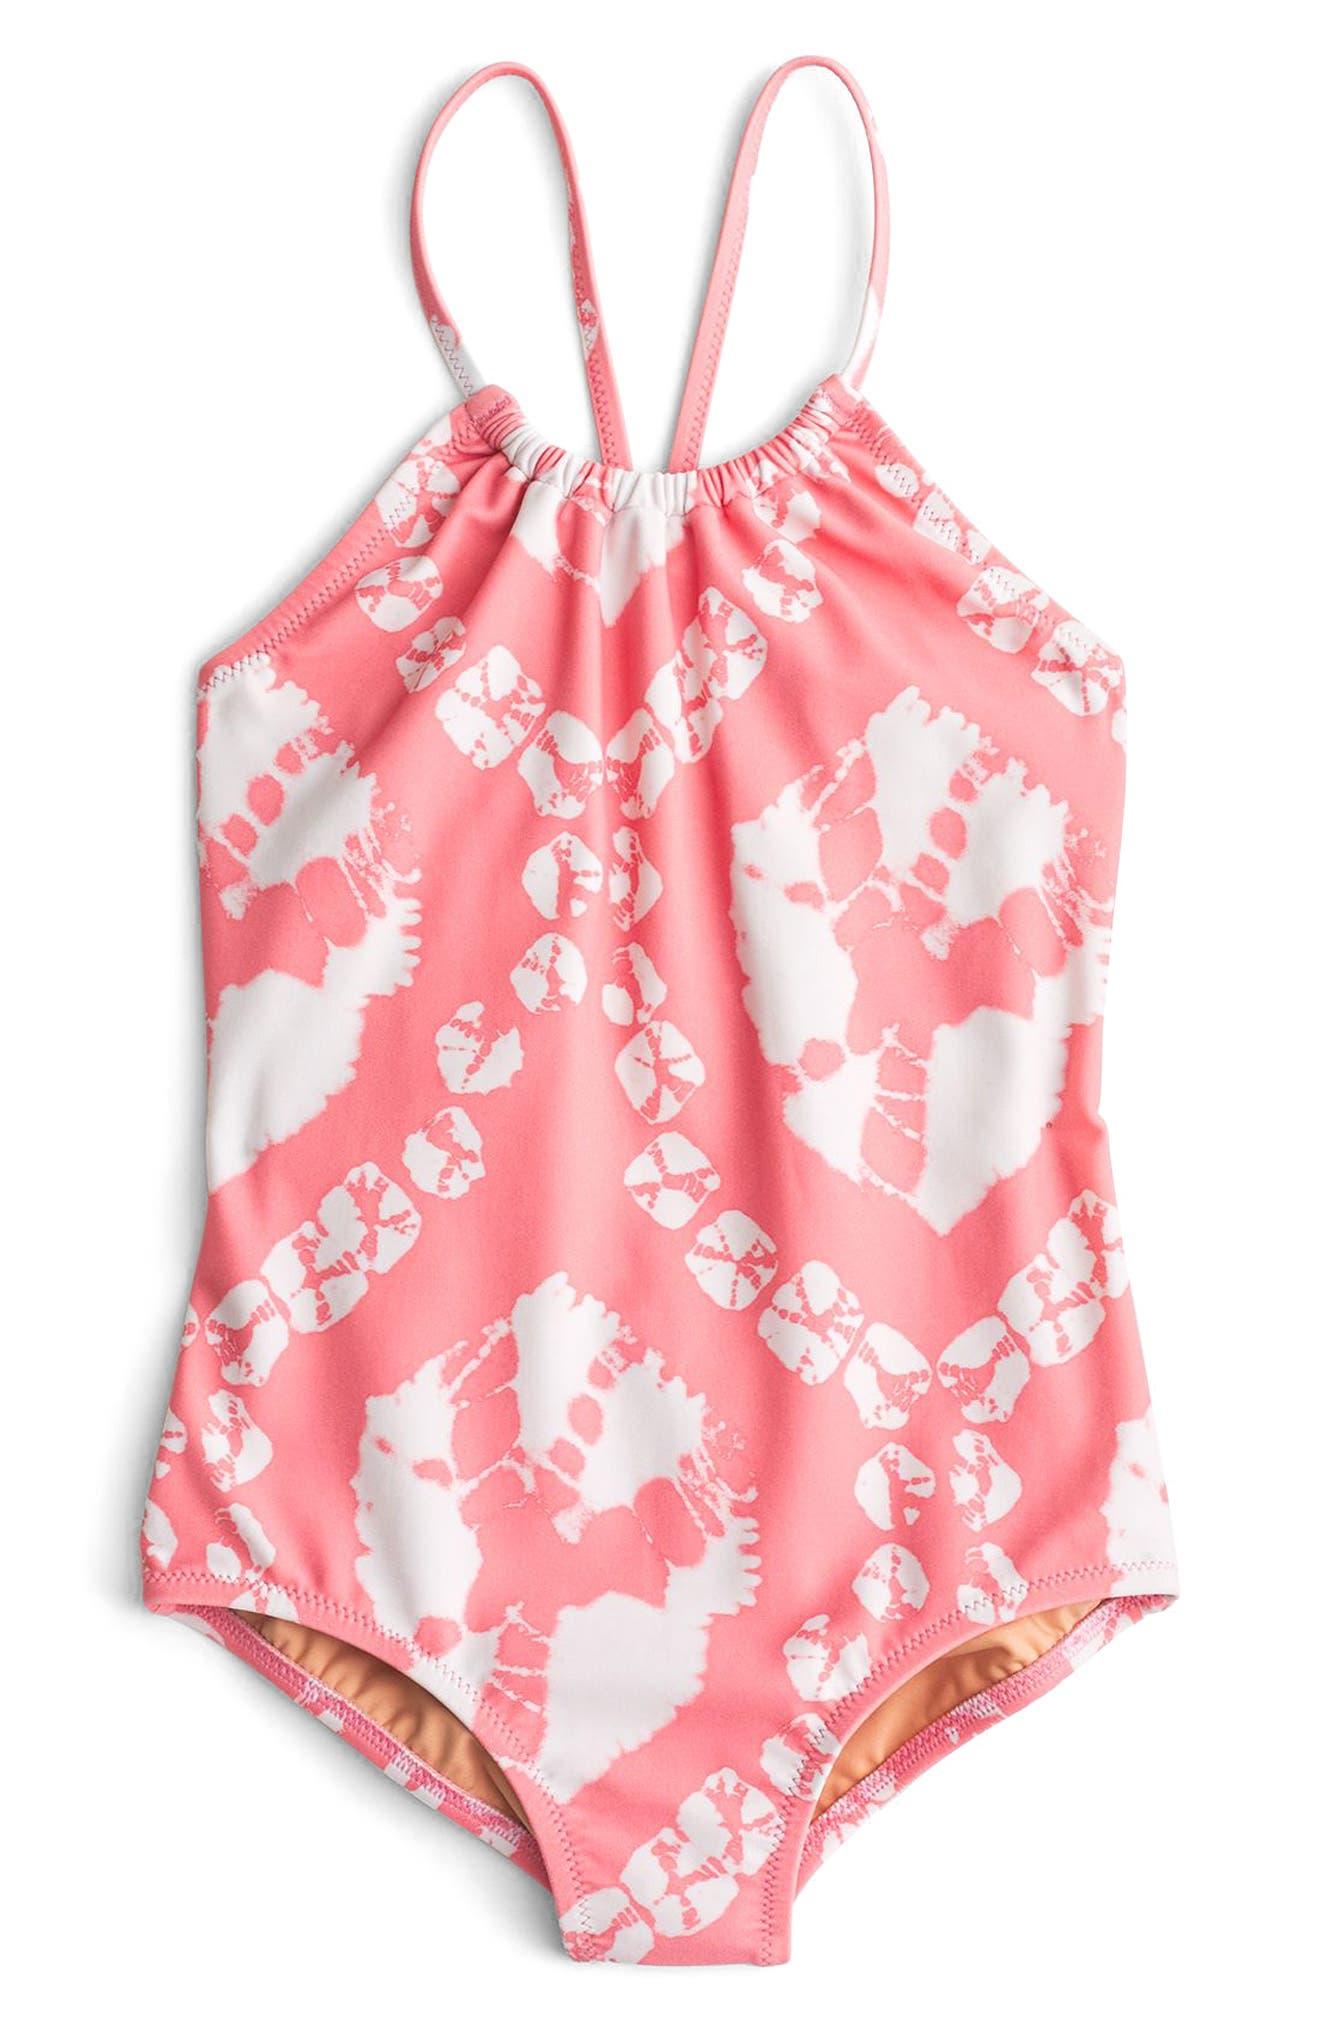 Tie Dye One-Piece Swimsuit,                             Main thumbnail 1, color,                             Pink Orange Multi Ka3139